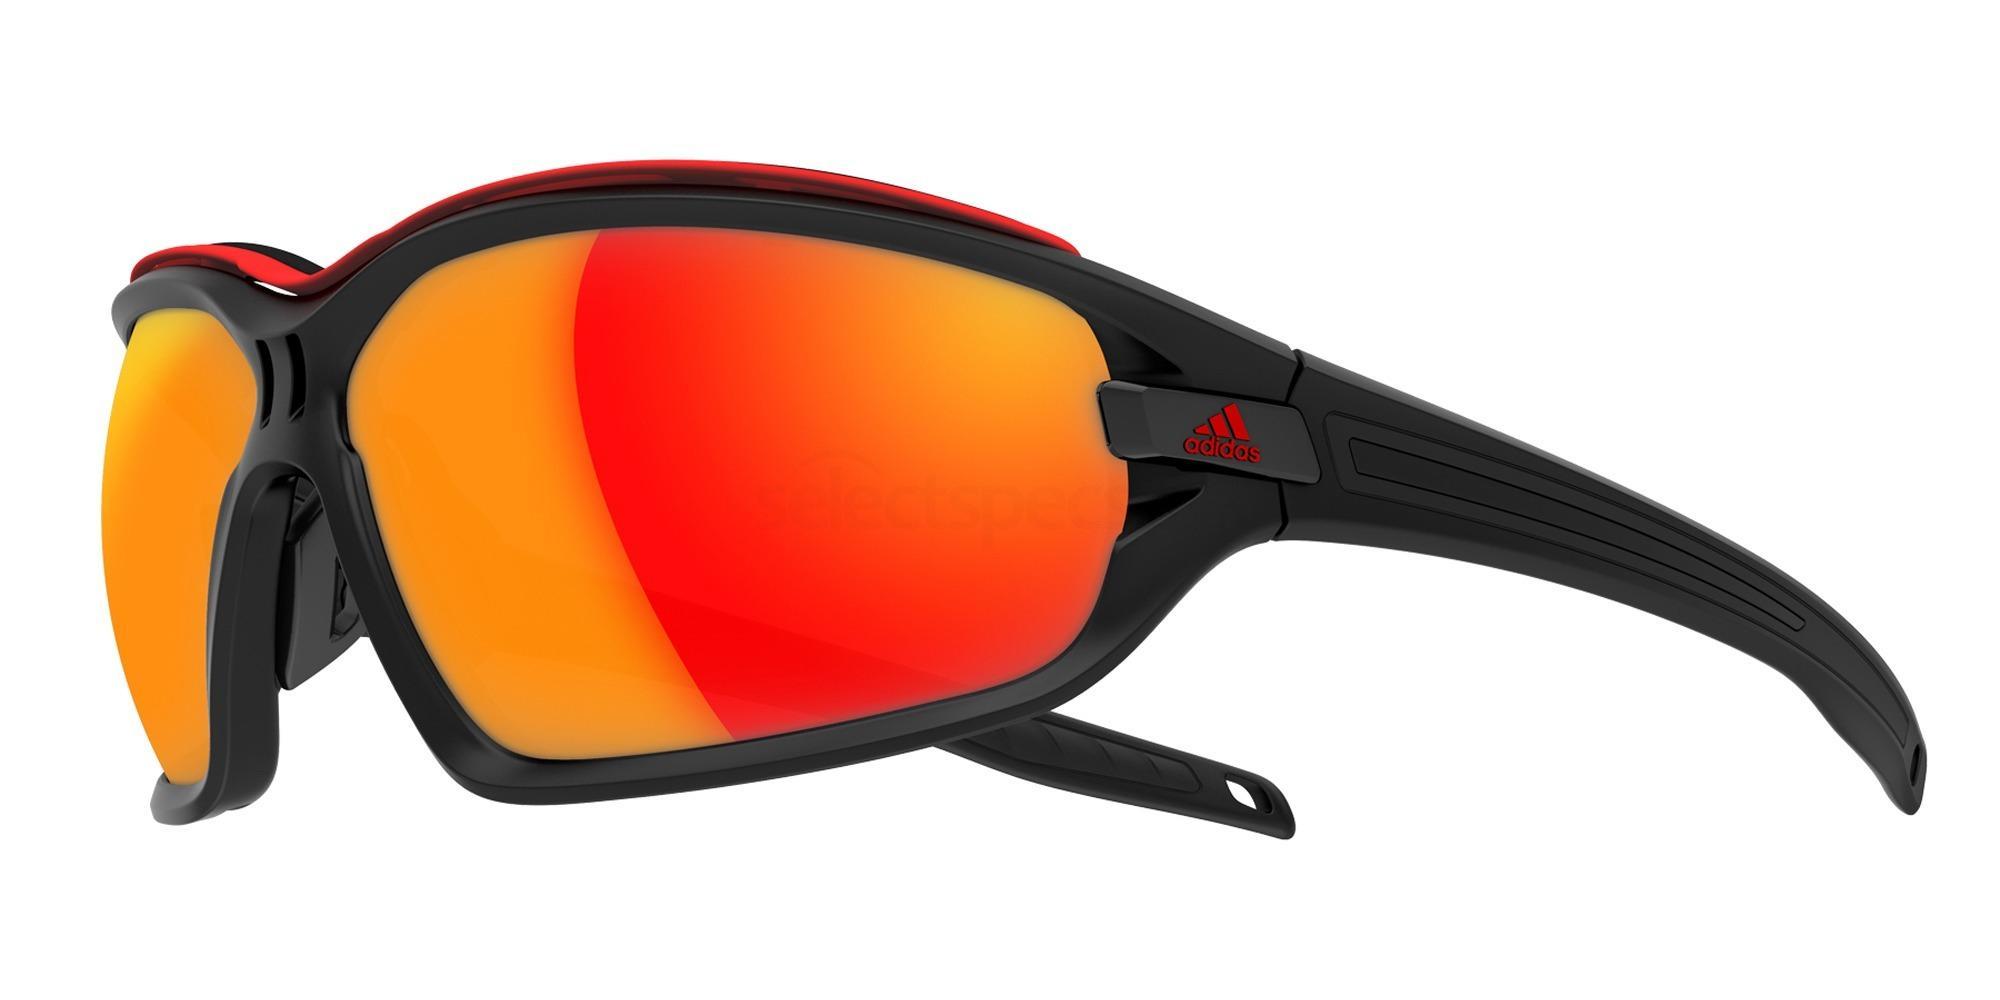 a194 00 6050 a194 evil eye evo pro S Sunglasses, Adidas